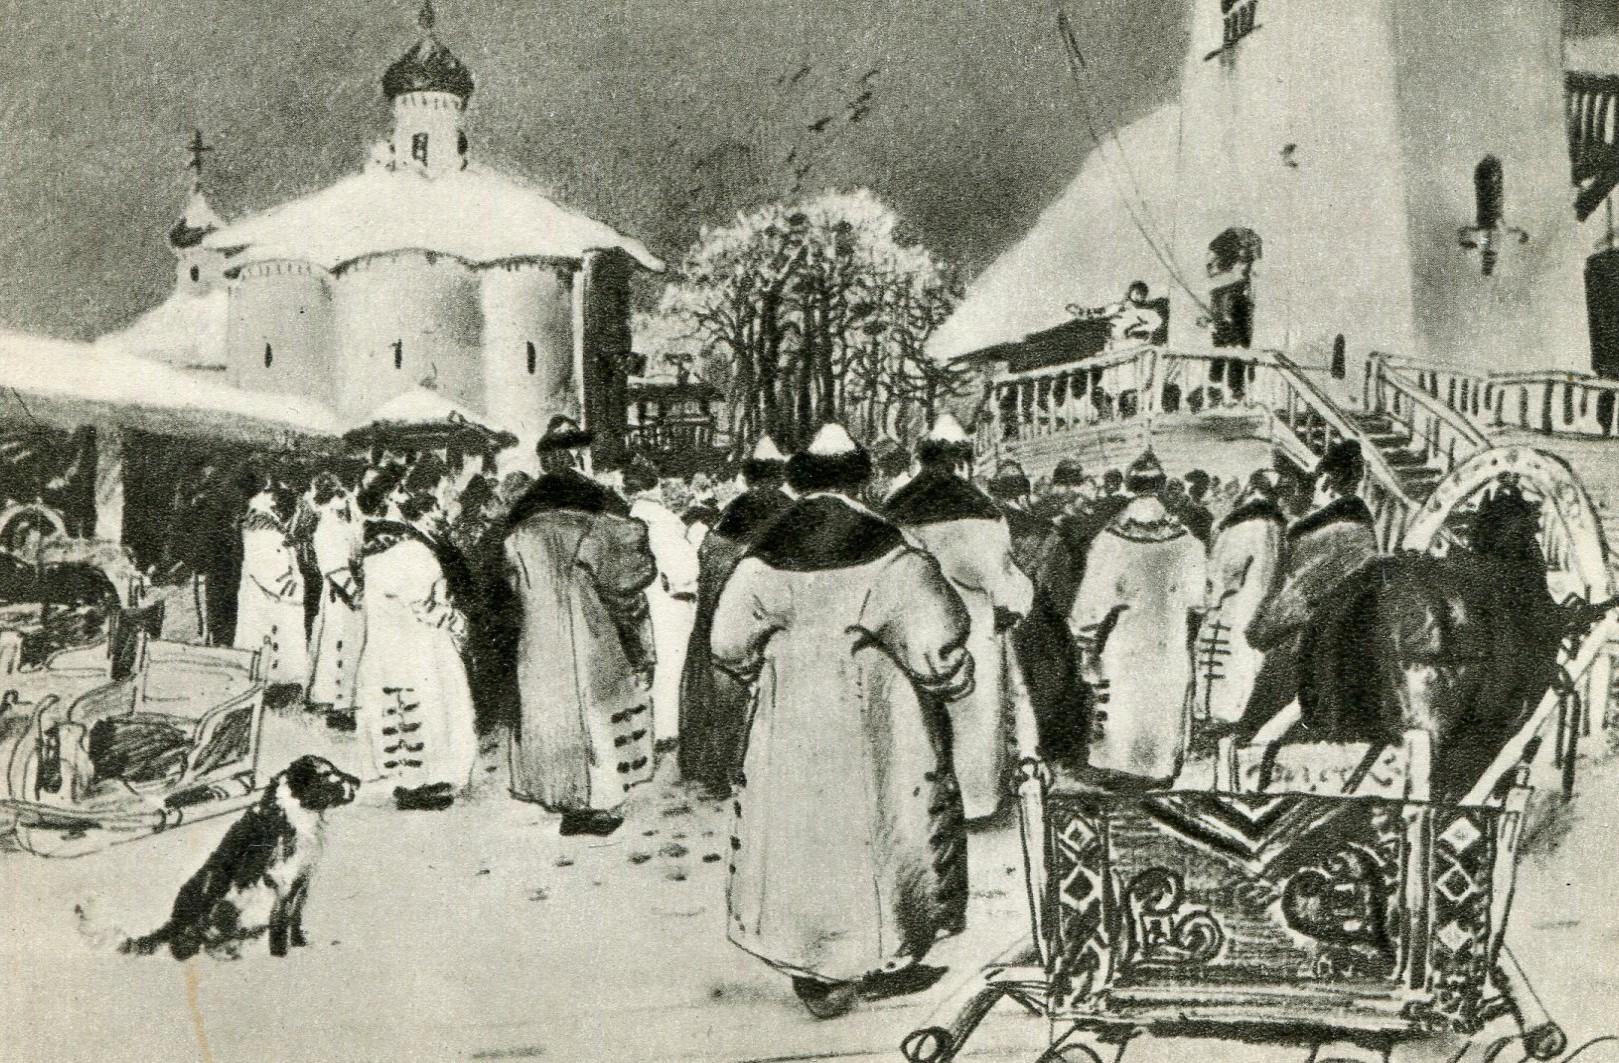 http://upload.wikimedia.org/wikipedia/commons/a/af/Veche_of_Novgorod.jpg?uselang=ru